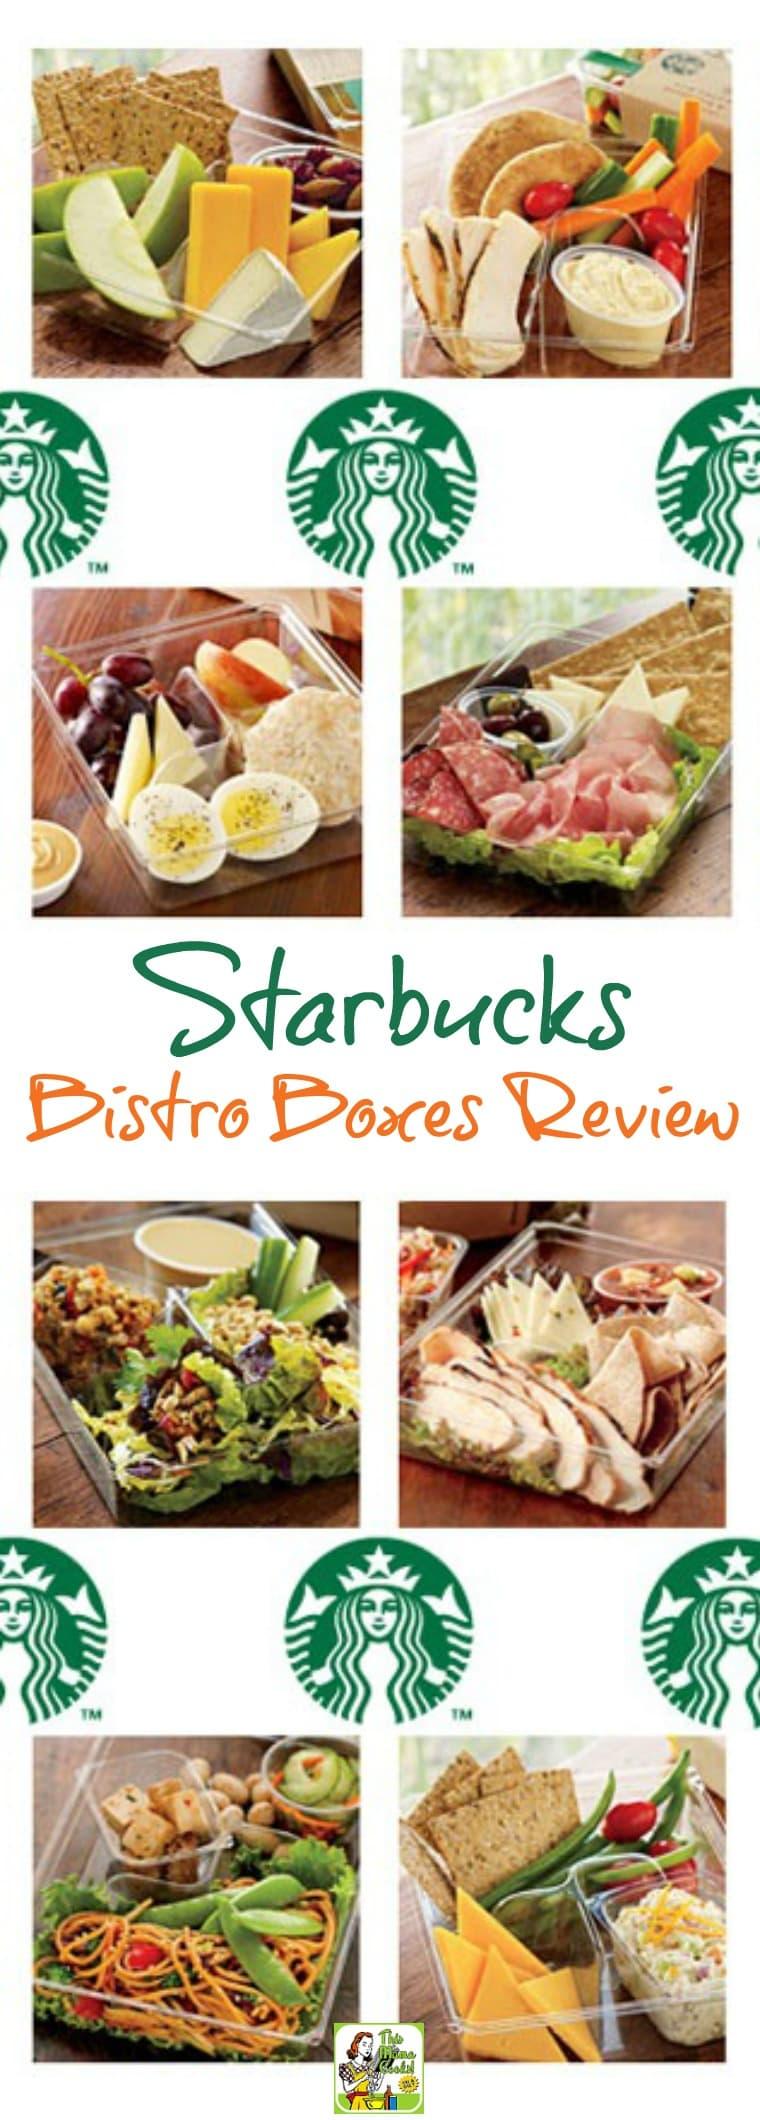 Starbucks Bistro Boxes Review. Includes a breakdown of Starbucks bistro box nutrition.